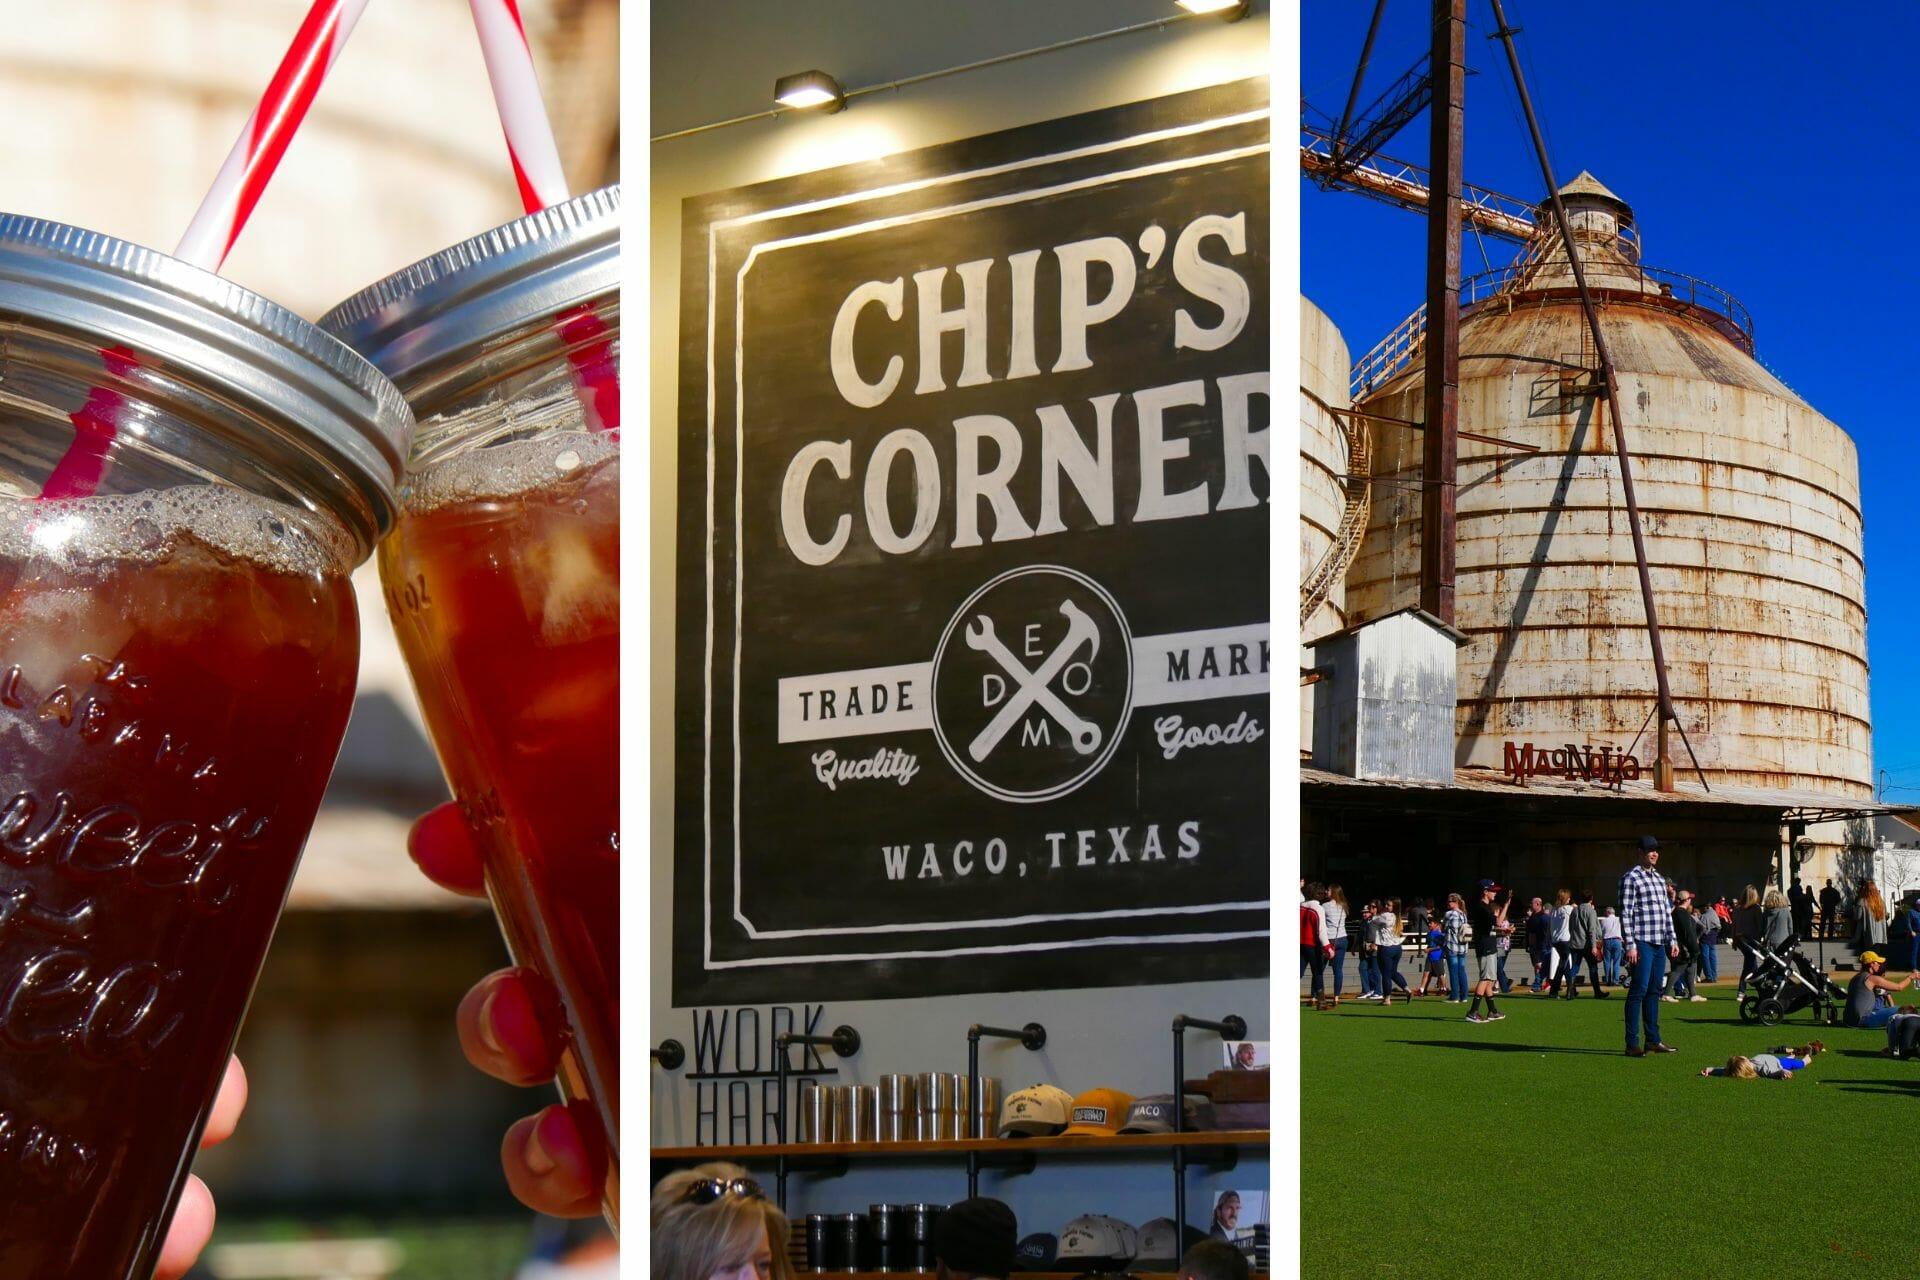 2021 Ultimate Guide for Visiting the Silos at Magnolia Market in Waco, Texas: A Fixer Upper Day Out via @allamericanatlas